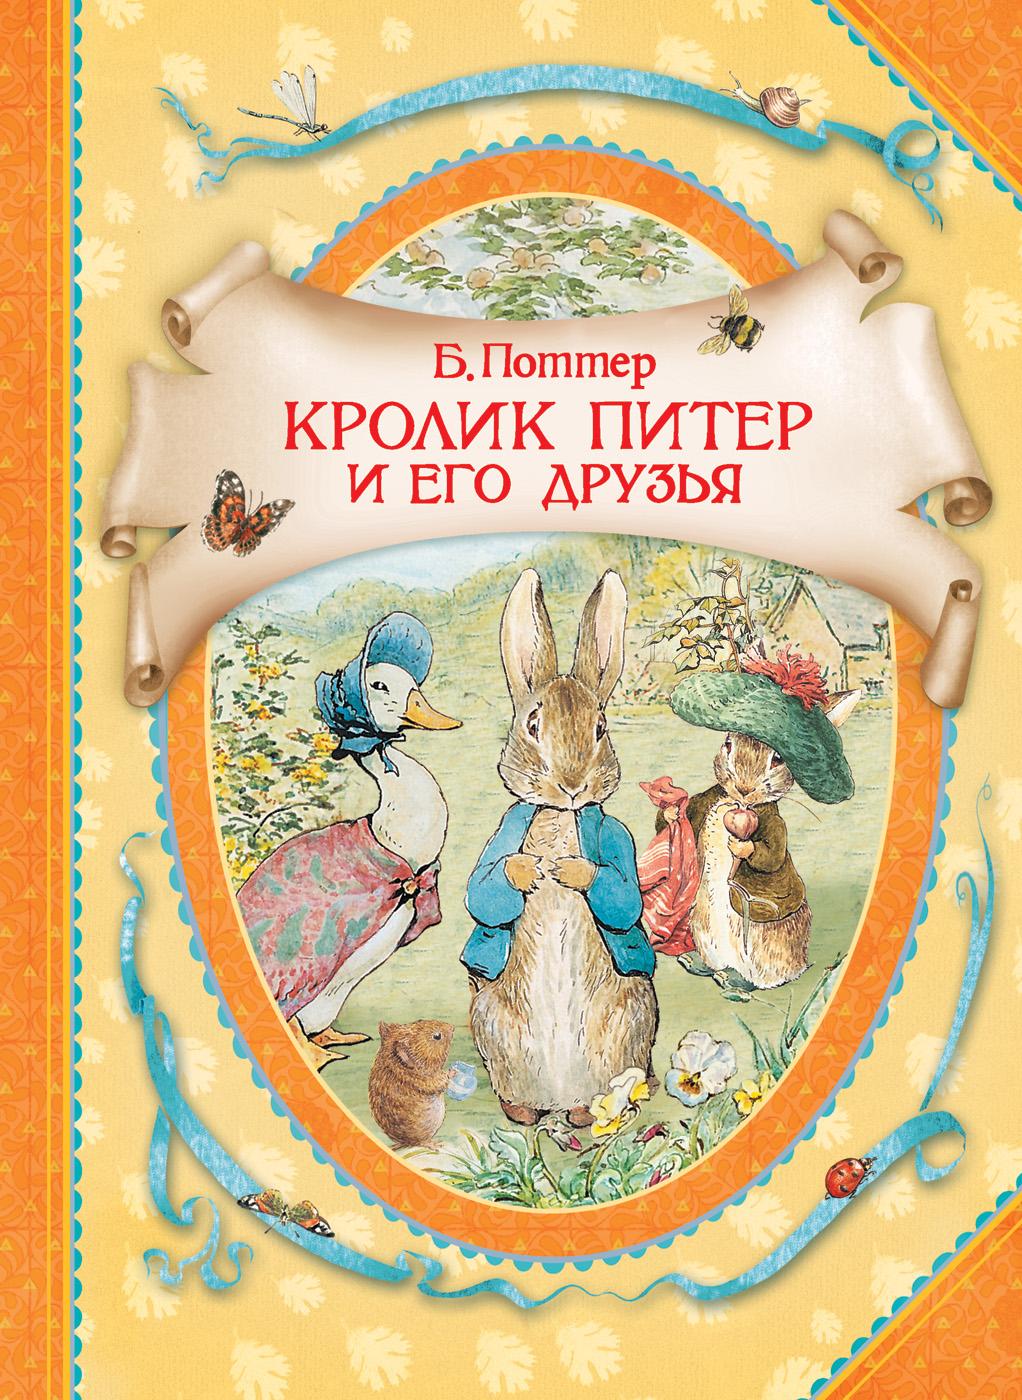 Поттер Б. Поттер Б. Кролик Питер и его друзья (ВГуС) поттер беатриса хелен все о кролике питере